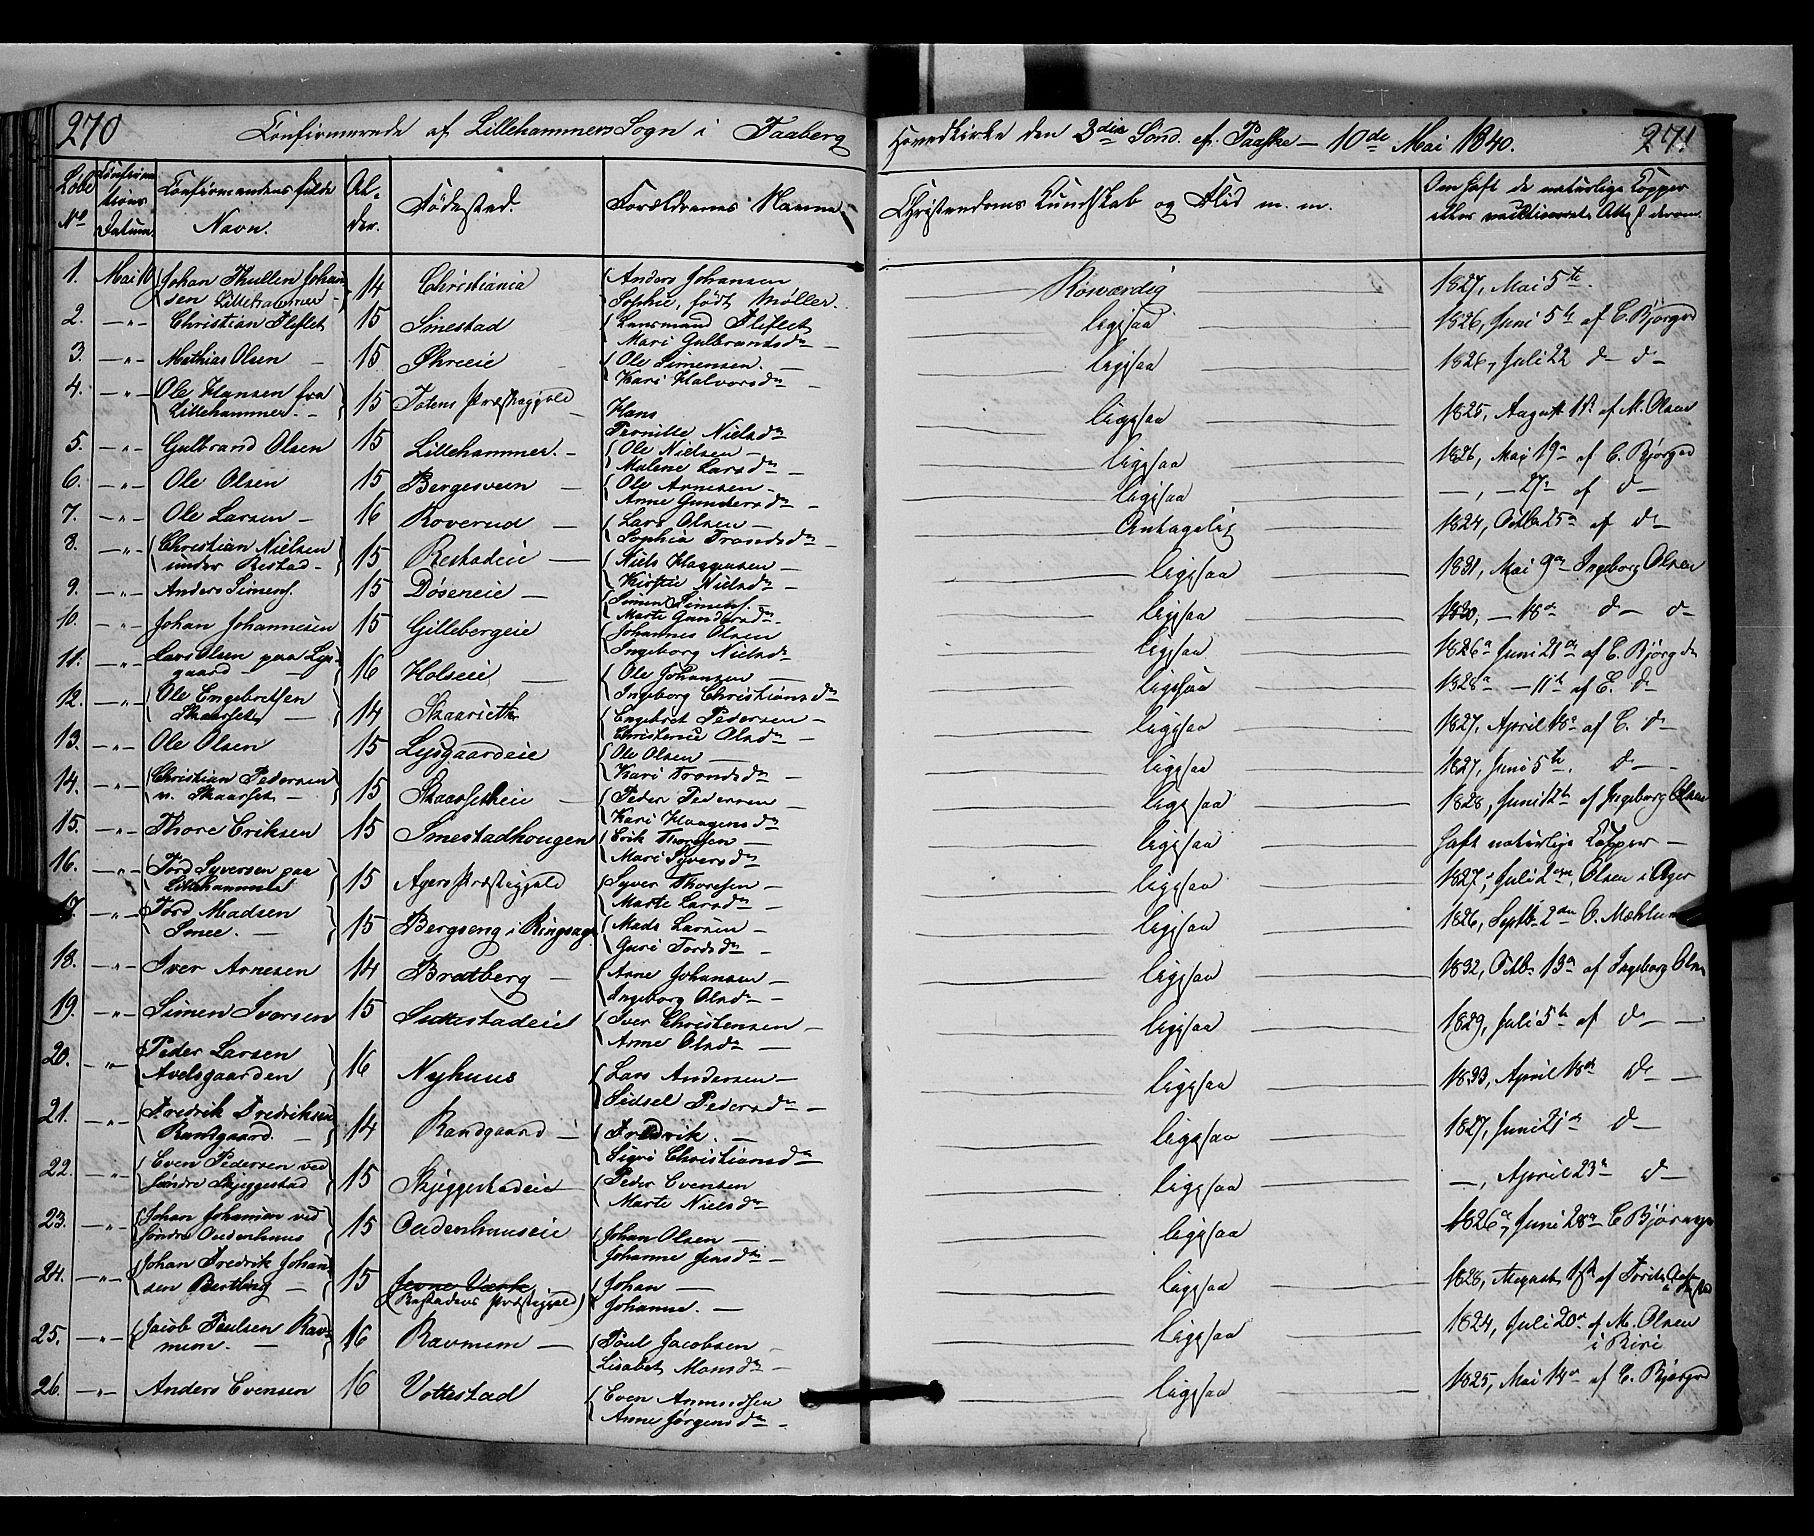 SAH, Fåberg prestekontor, Klokkerbok nr. 6, 1837-1855, s. 270-271